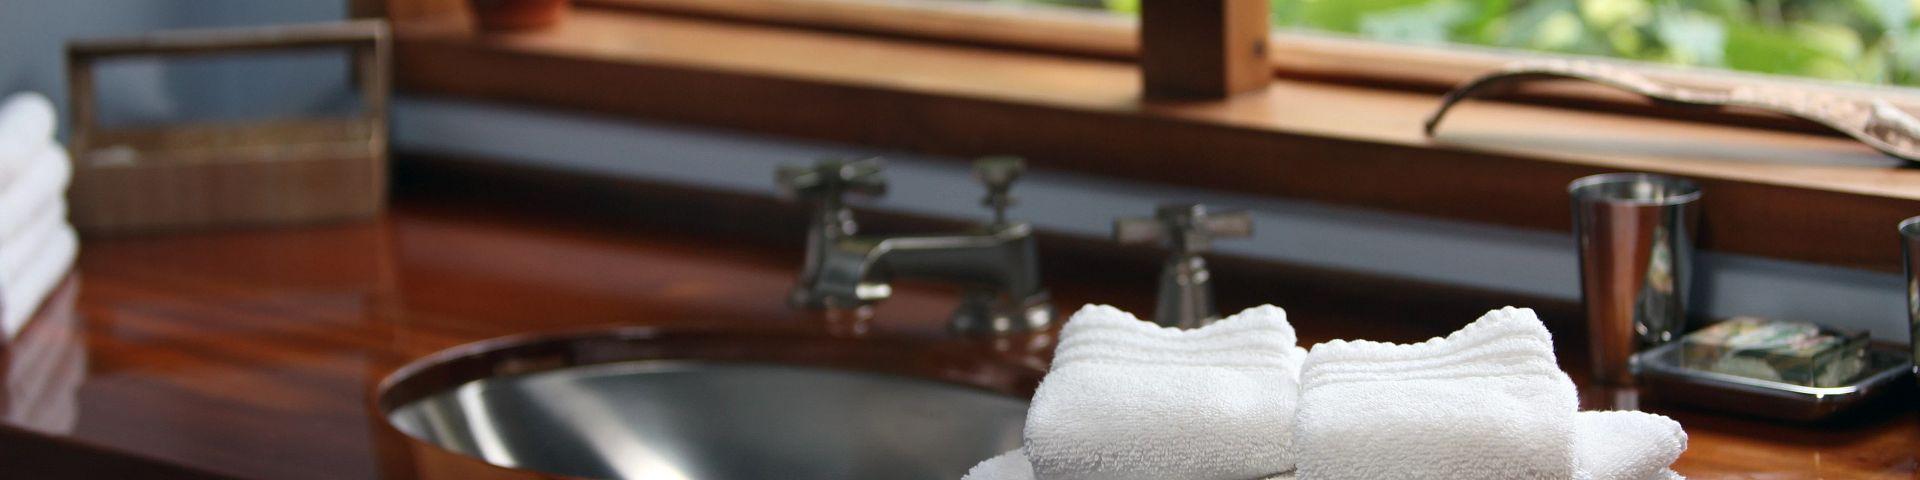 Countertop Towels